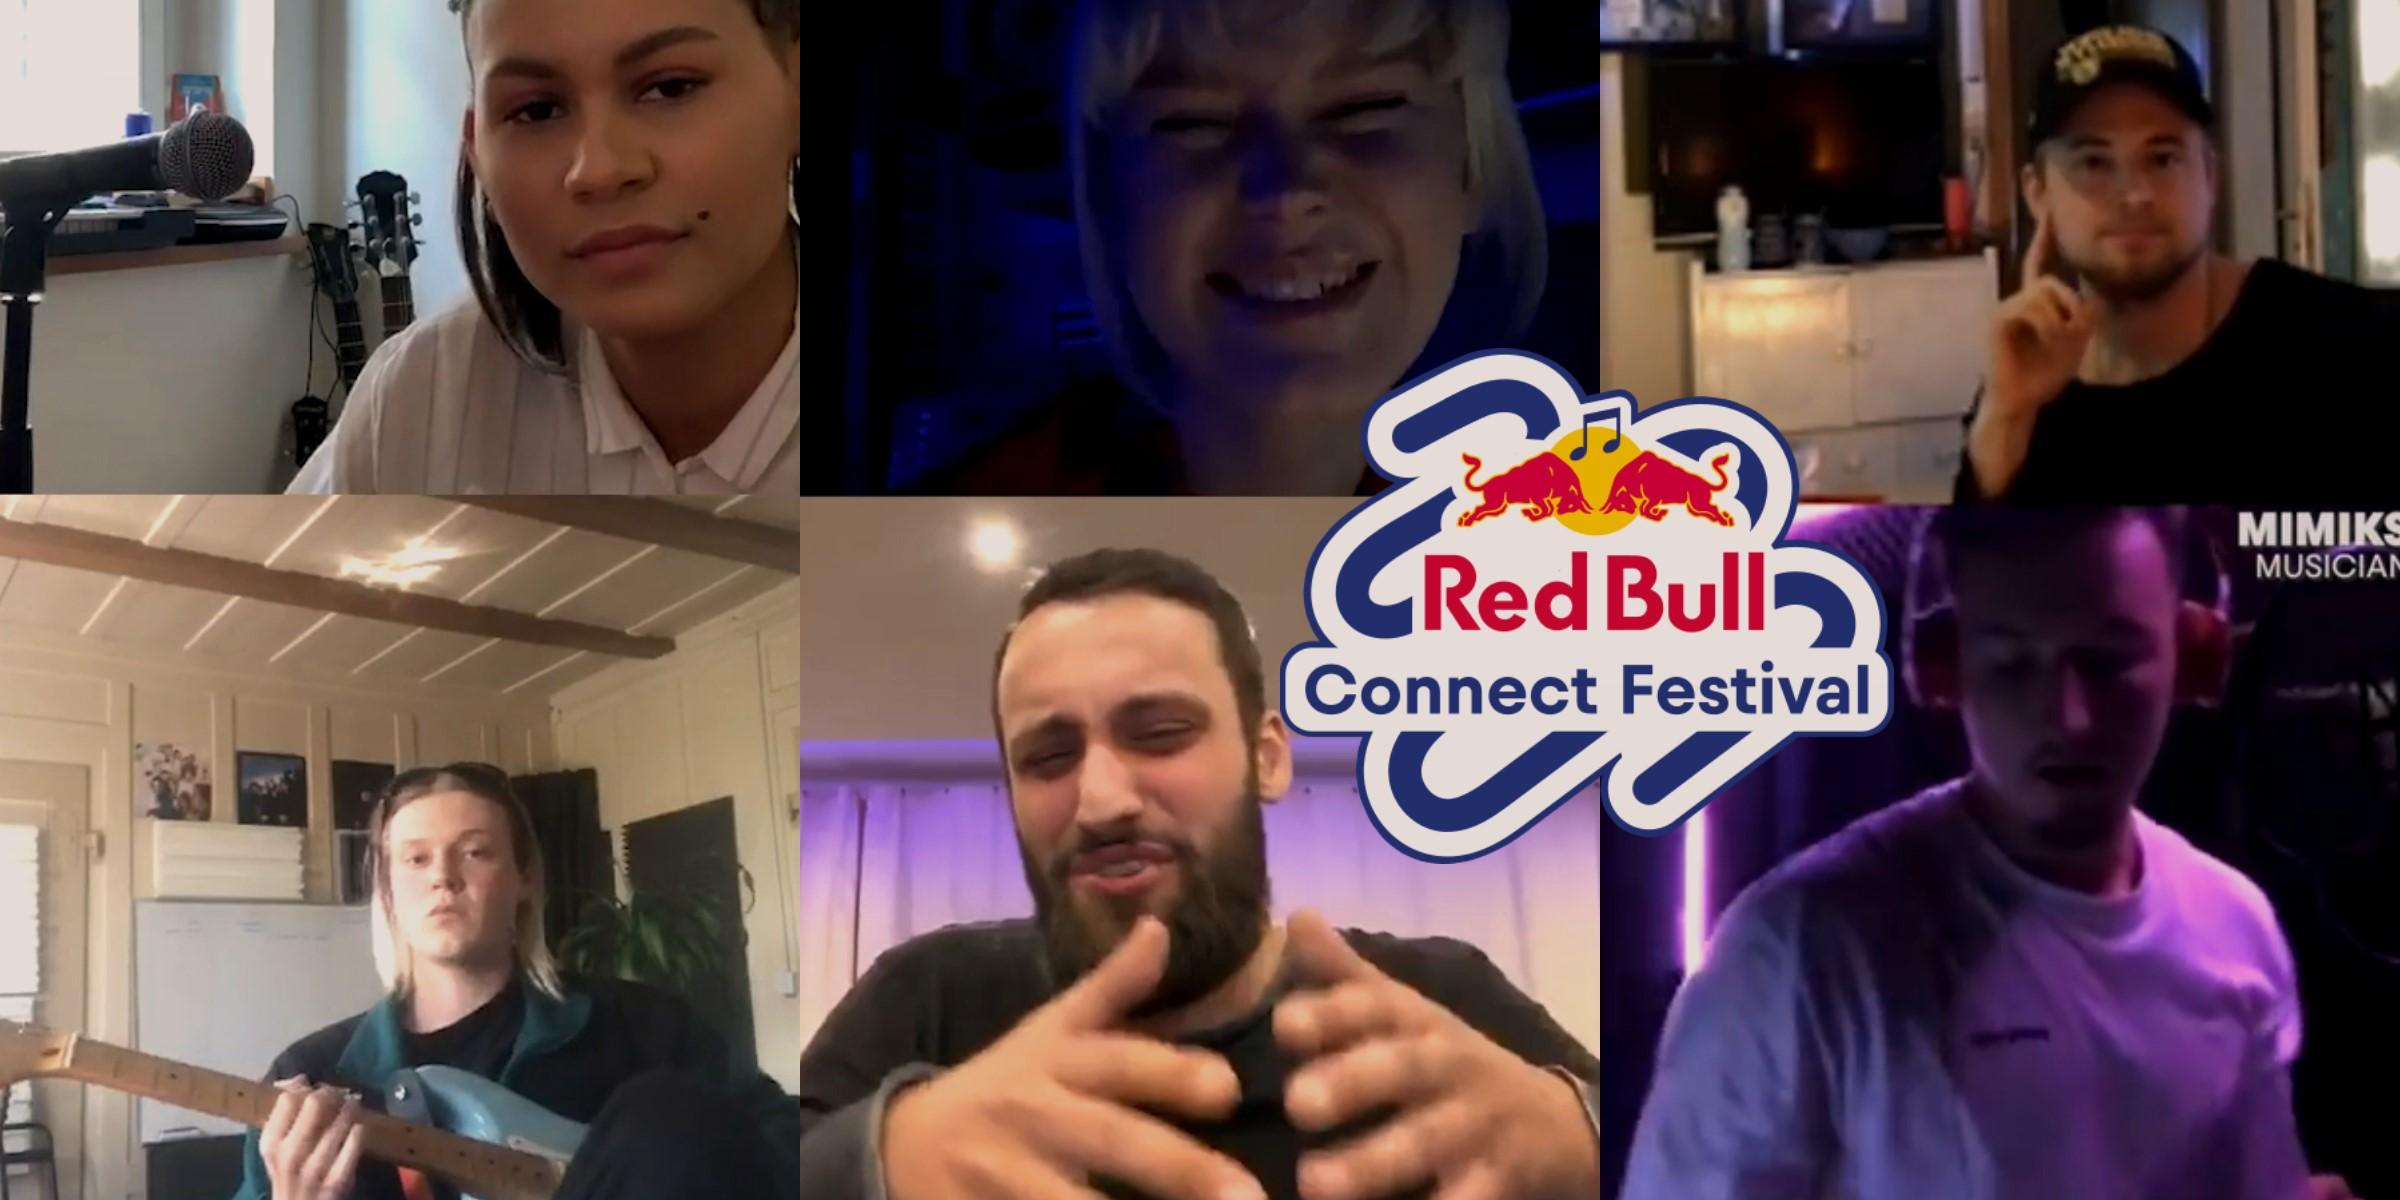 Ivorrie flasht Xen – Feature kommt: Das alles ist am Red Bull Connect Festival passiert